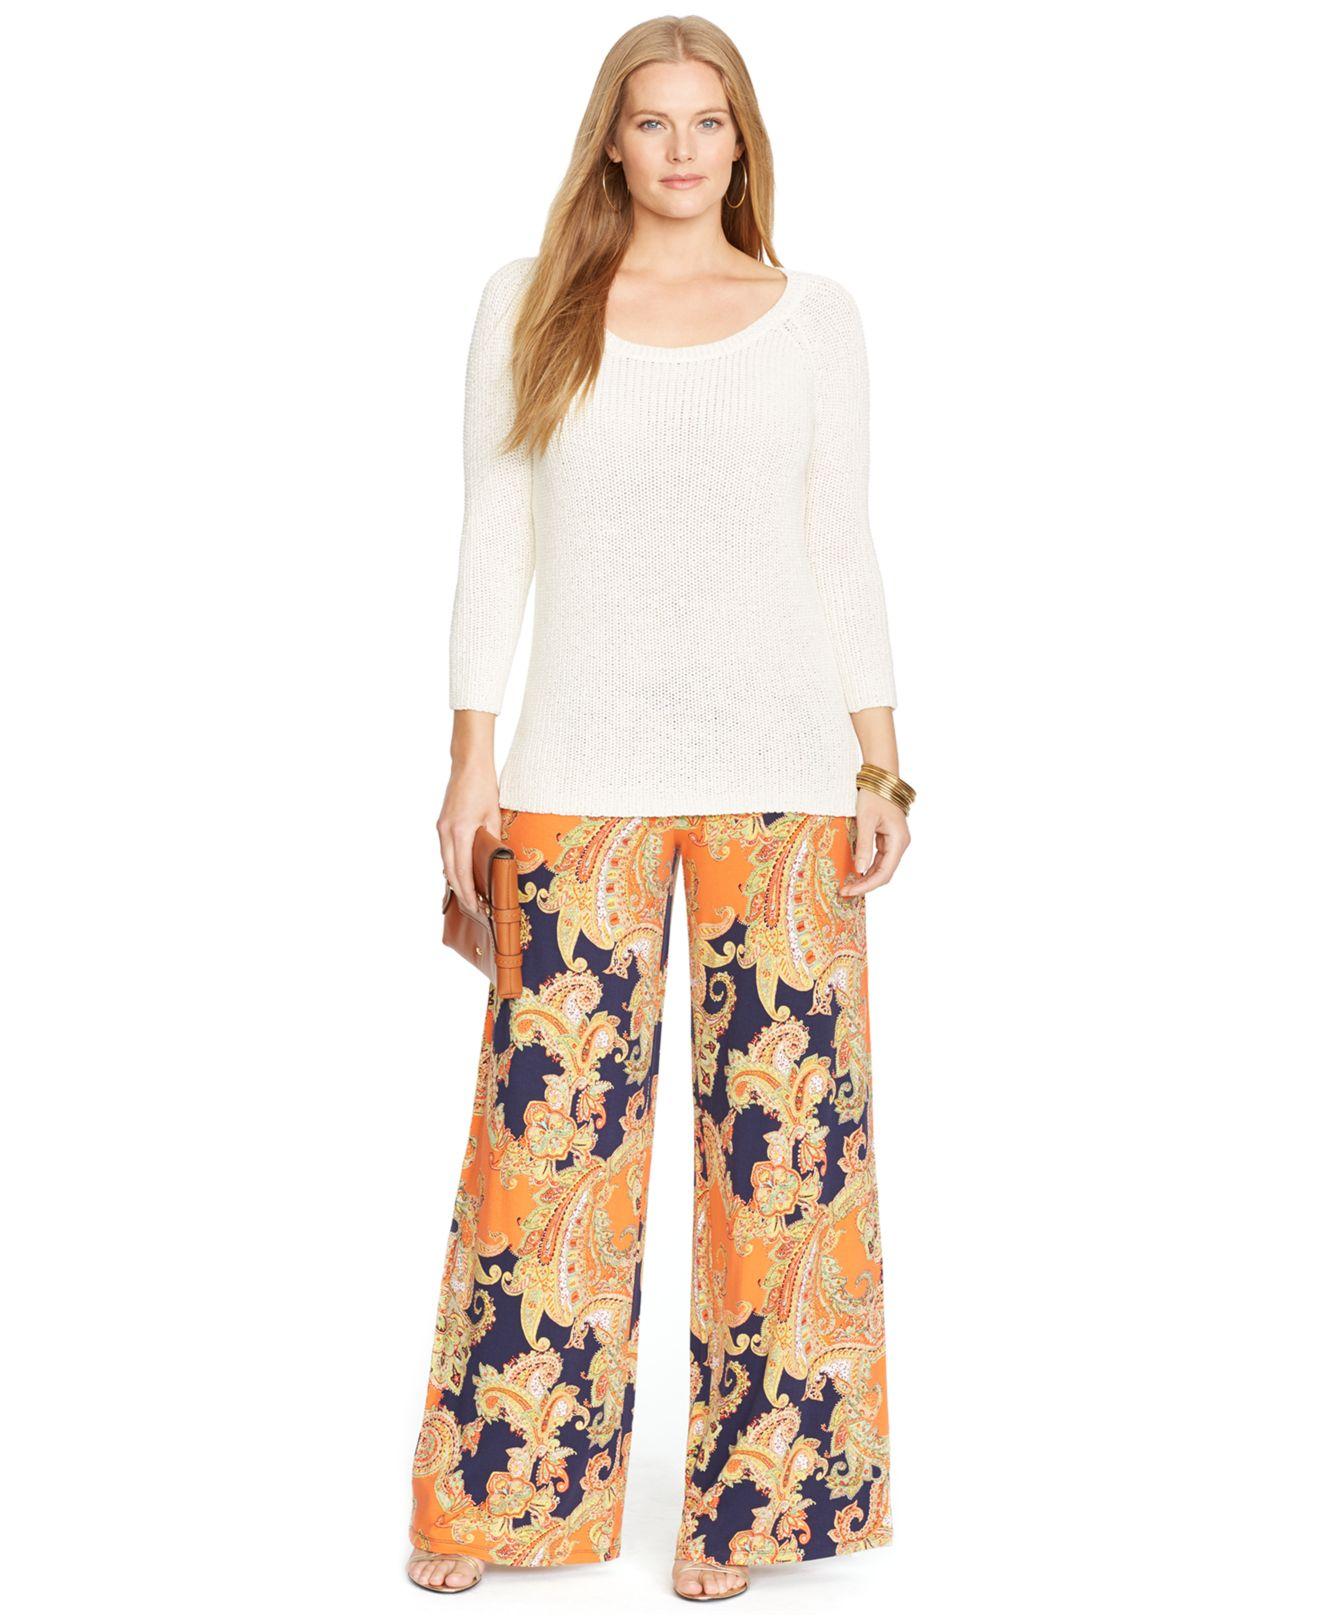 Plus Size Wide Leg Jeans For Women